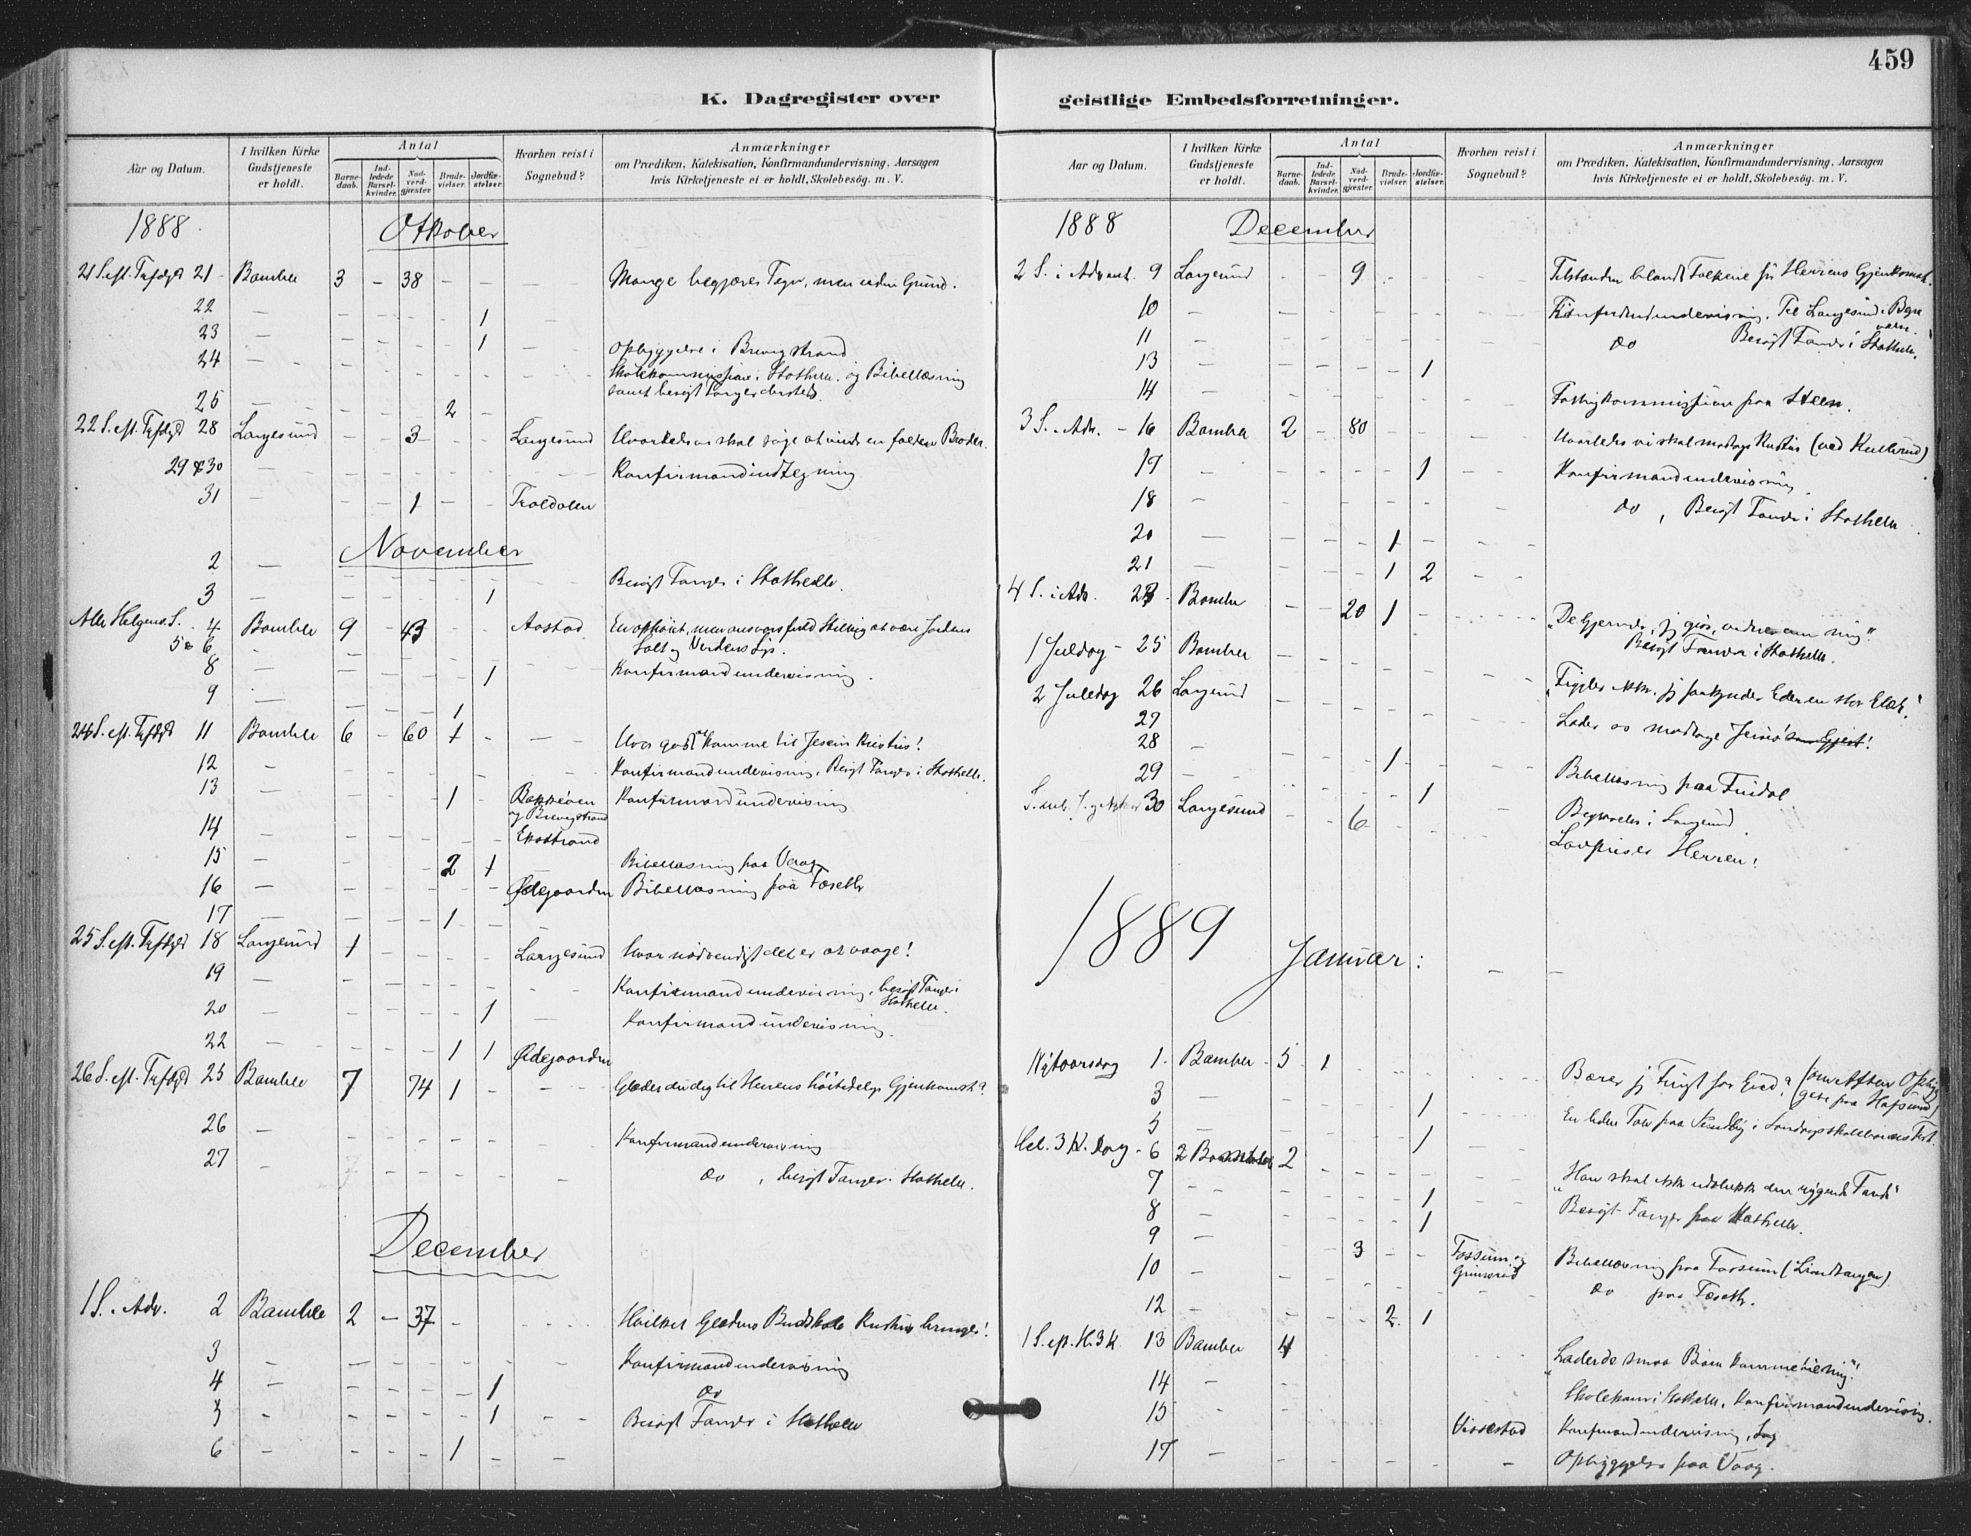 SAKO, Bamble kirkebøker, F/Fa/L0008: Ministerialbok nr. I 8, 1888-1900, s. 459